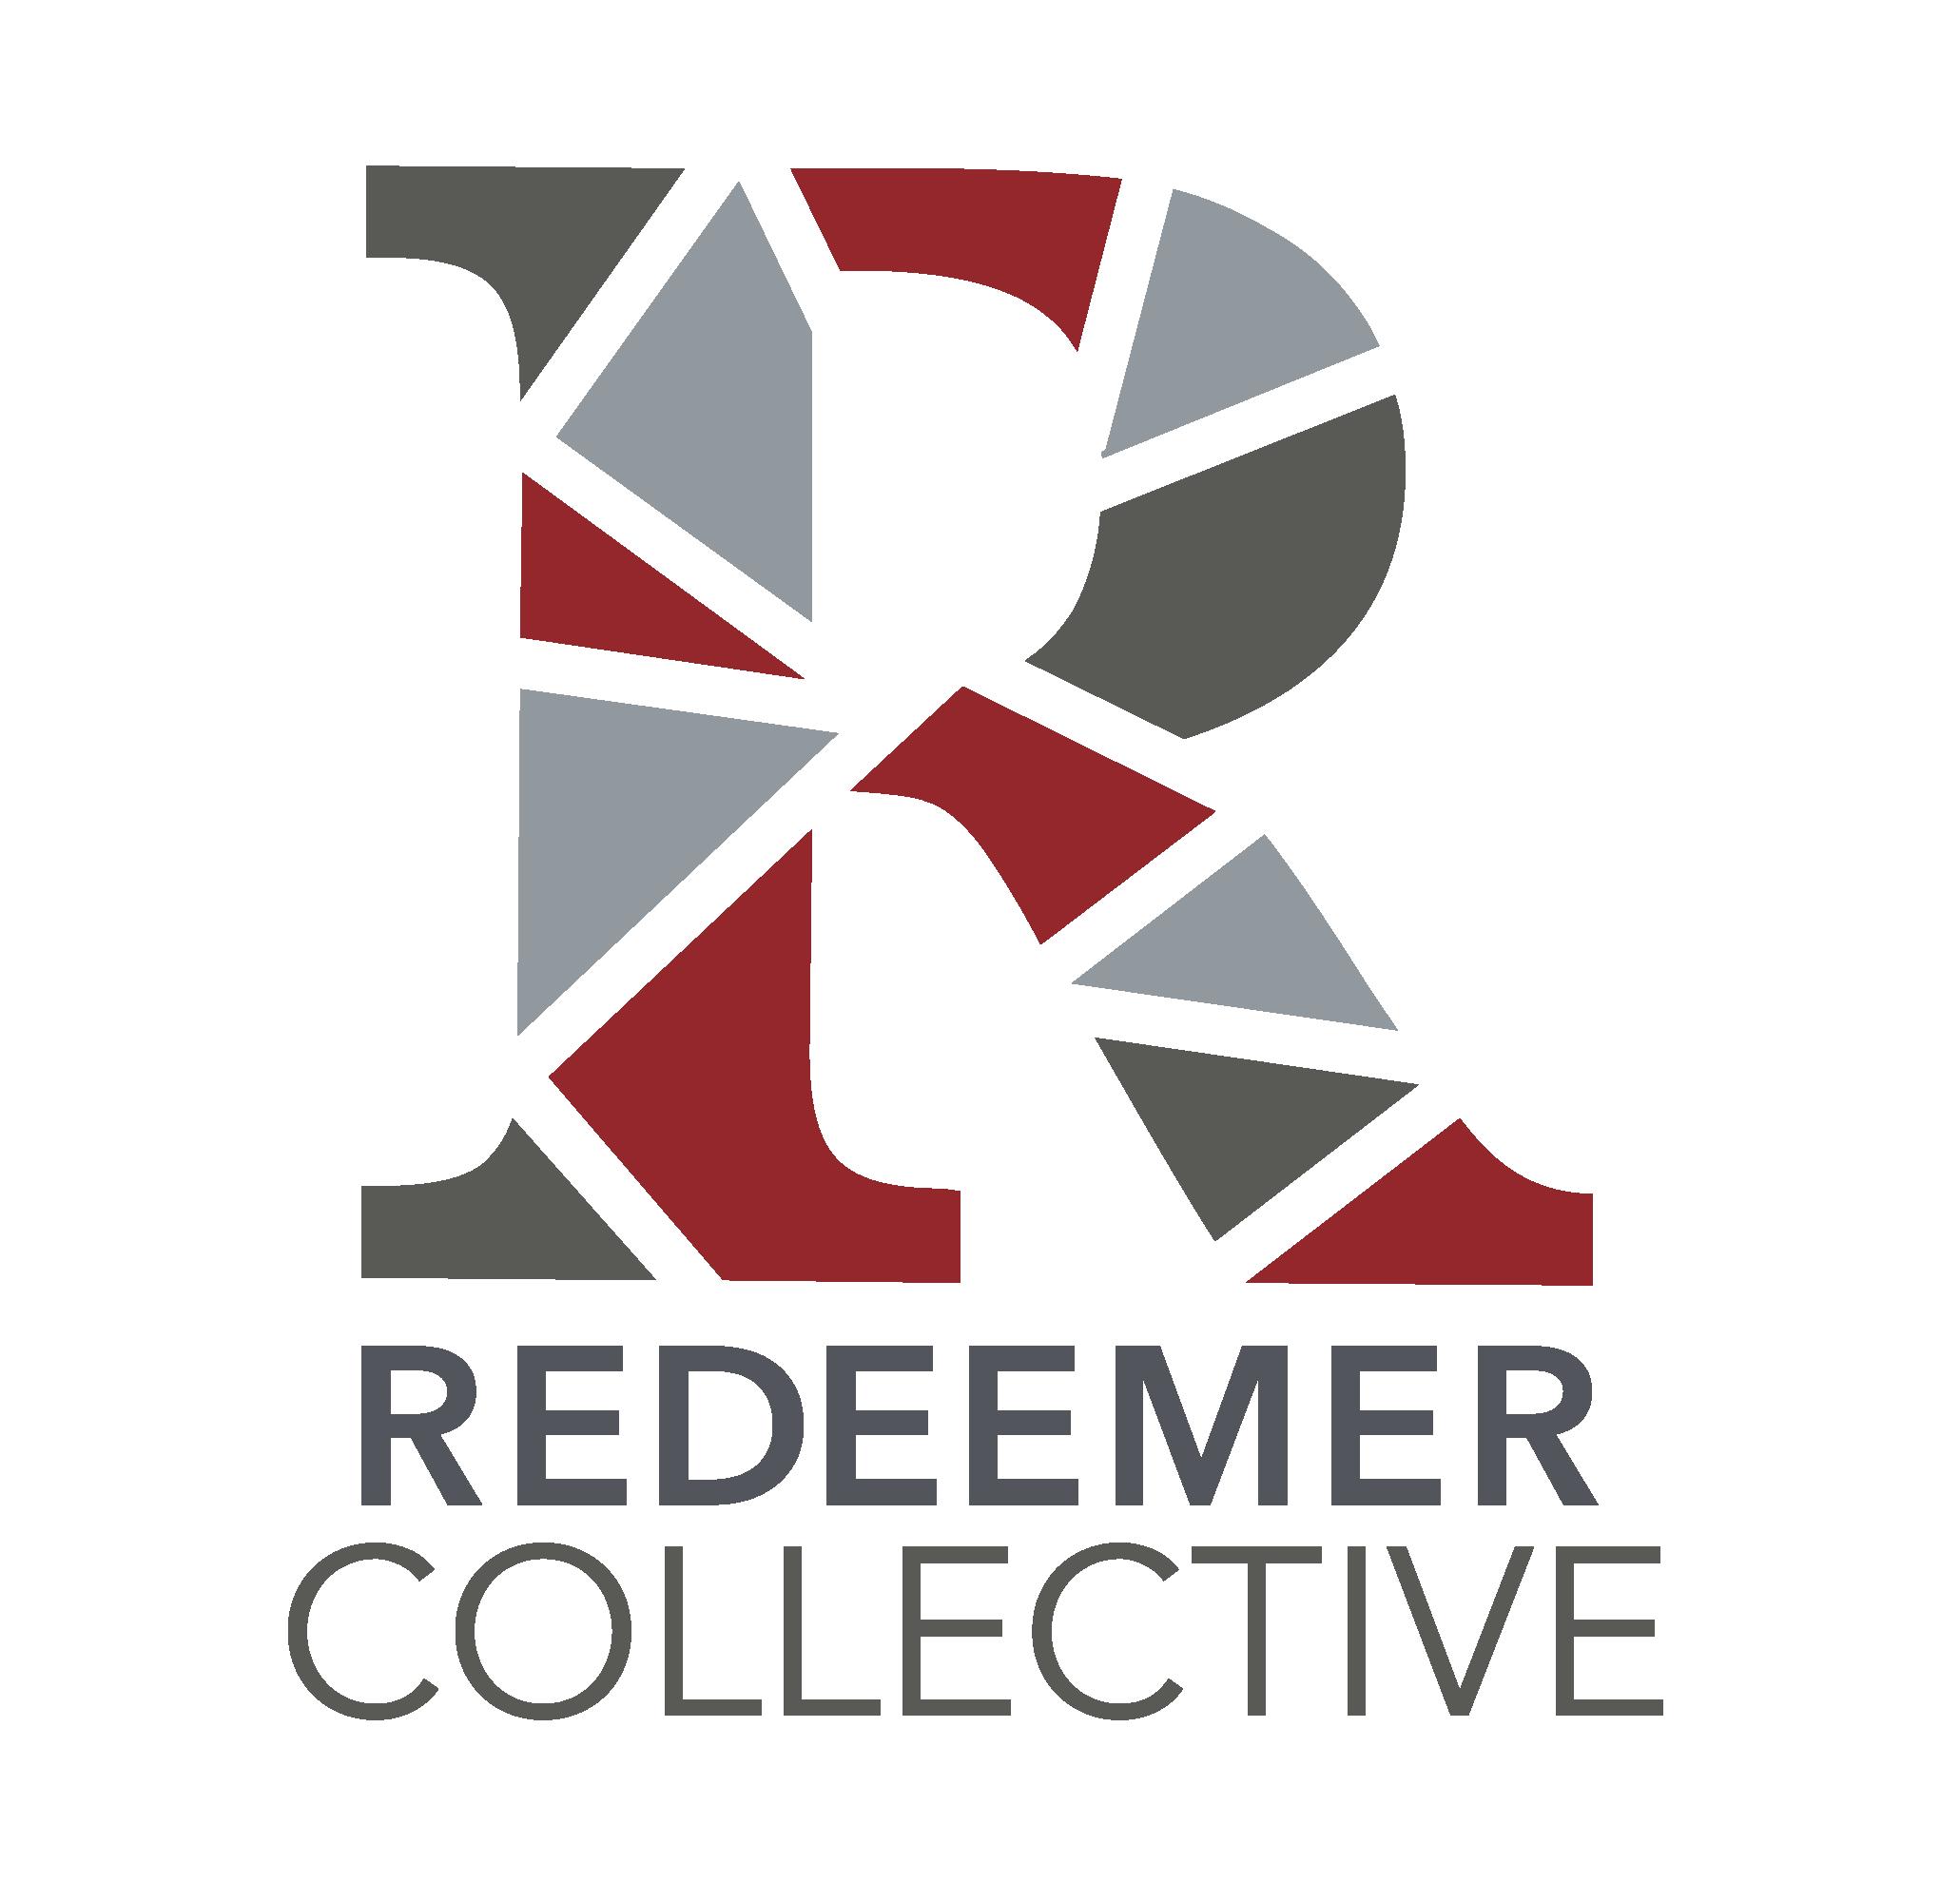 Redeemer Collective Logos_Big R.png